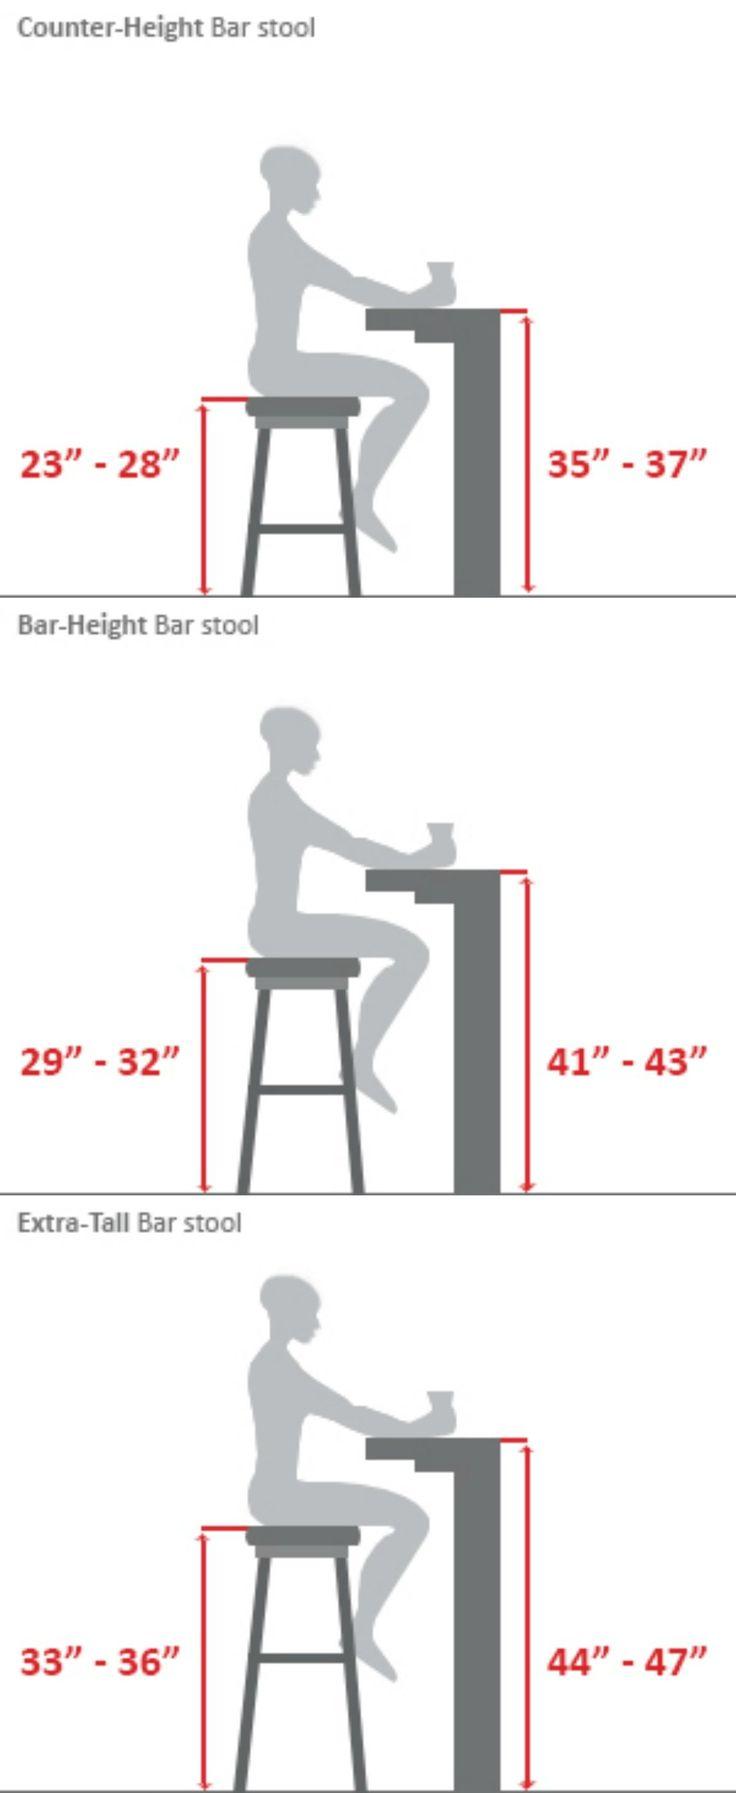 Bar stool sizing guide.